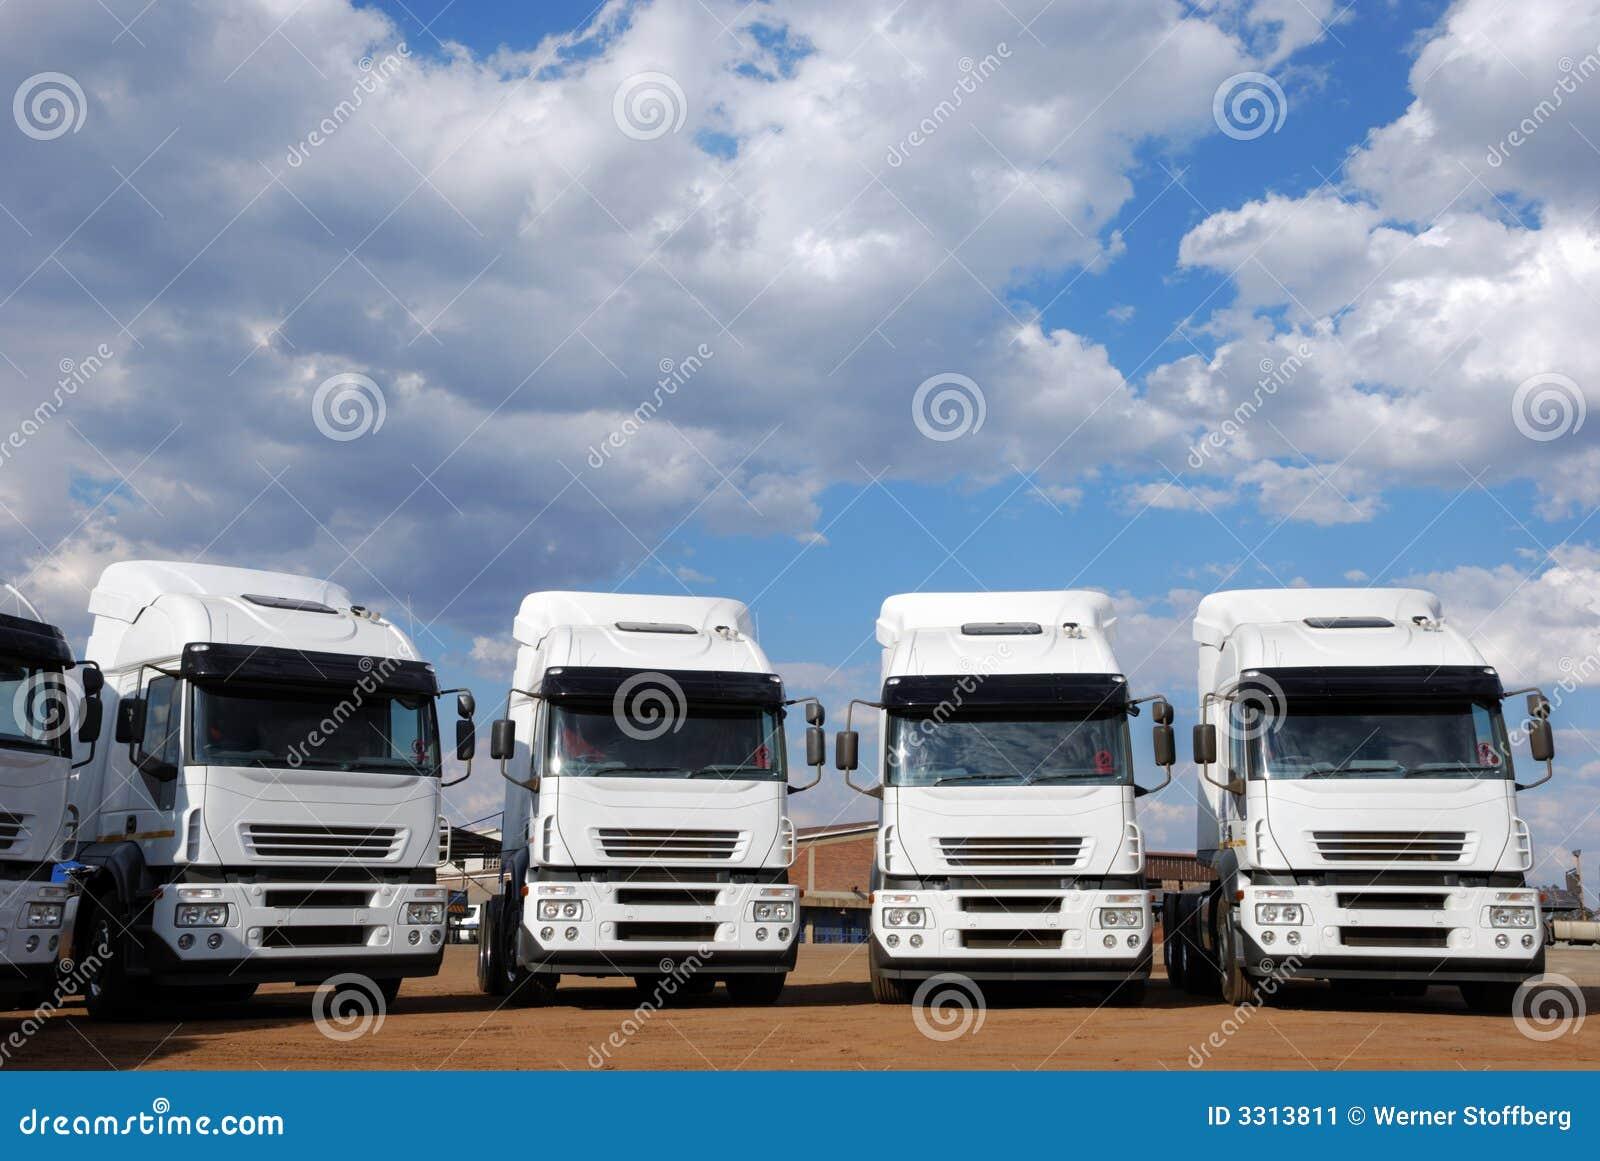 Ciężarówka pełna